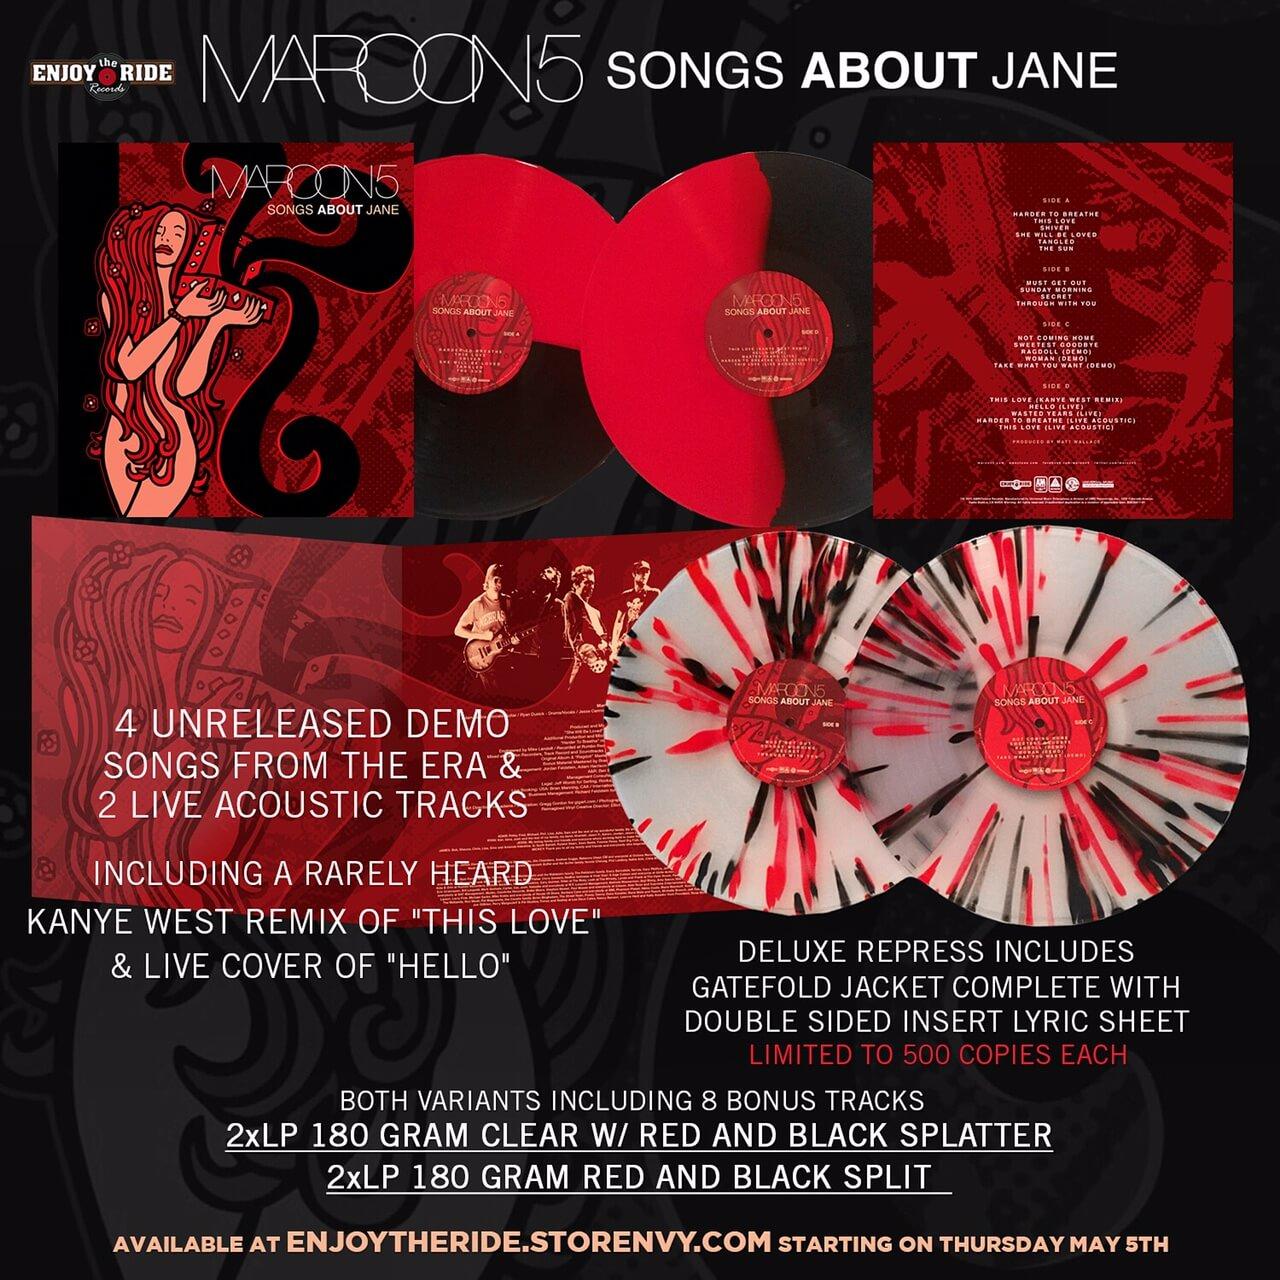 New Pressing Maroon 5 Songs About Jane Modern Vinyl